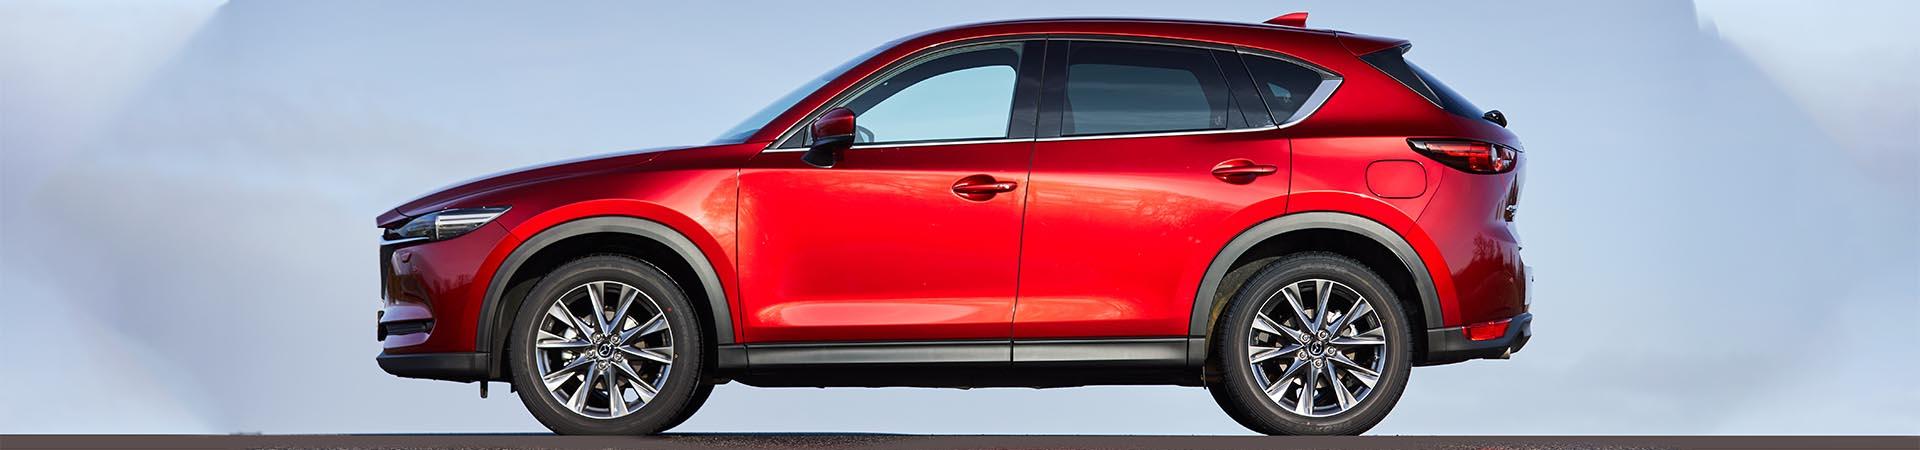 Mazda CX5 Header